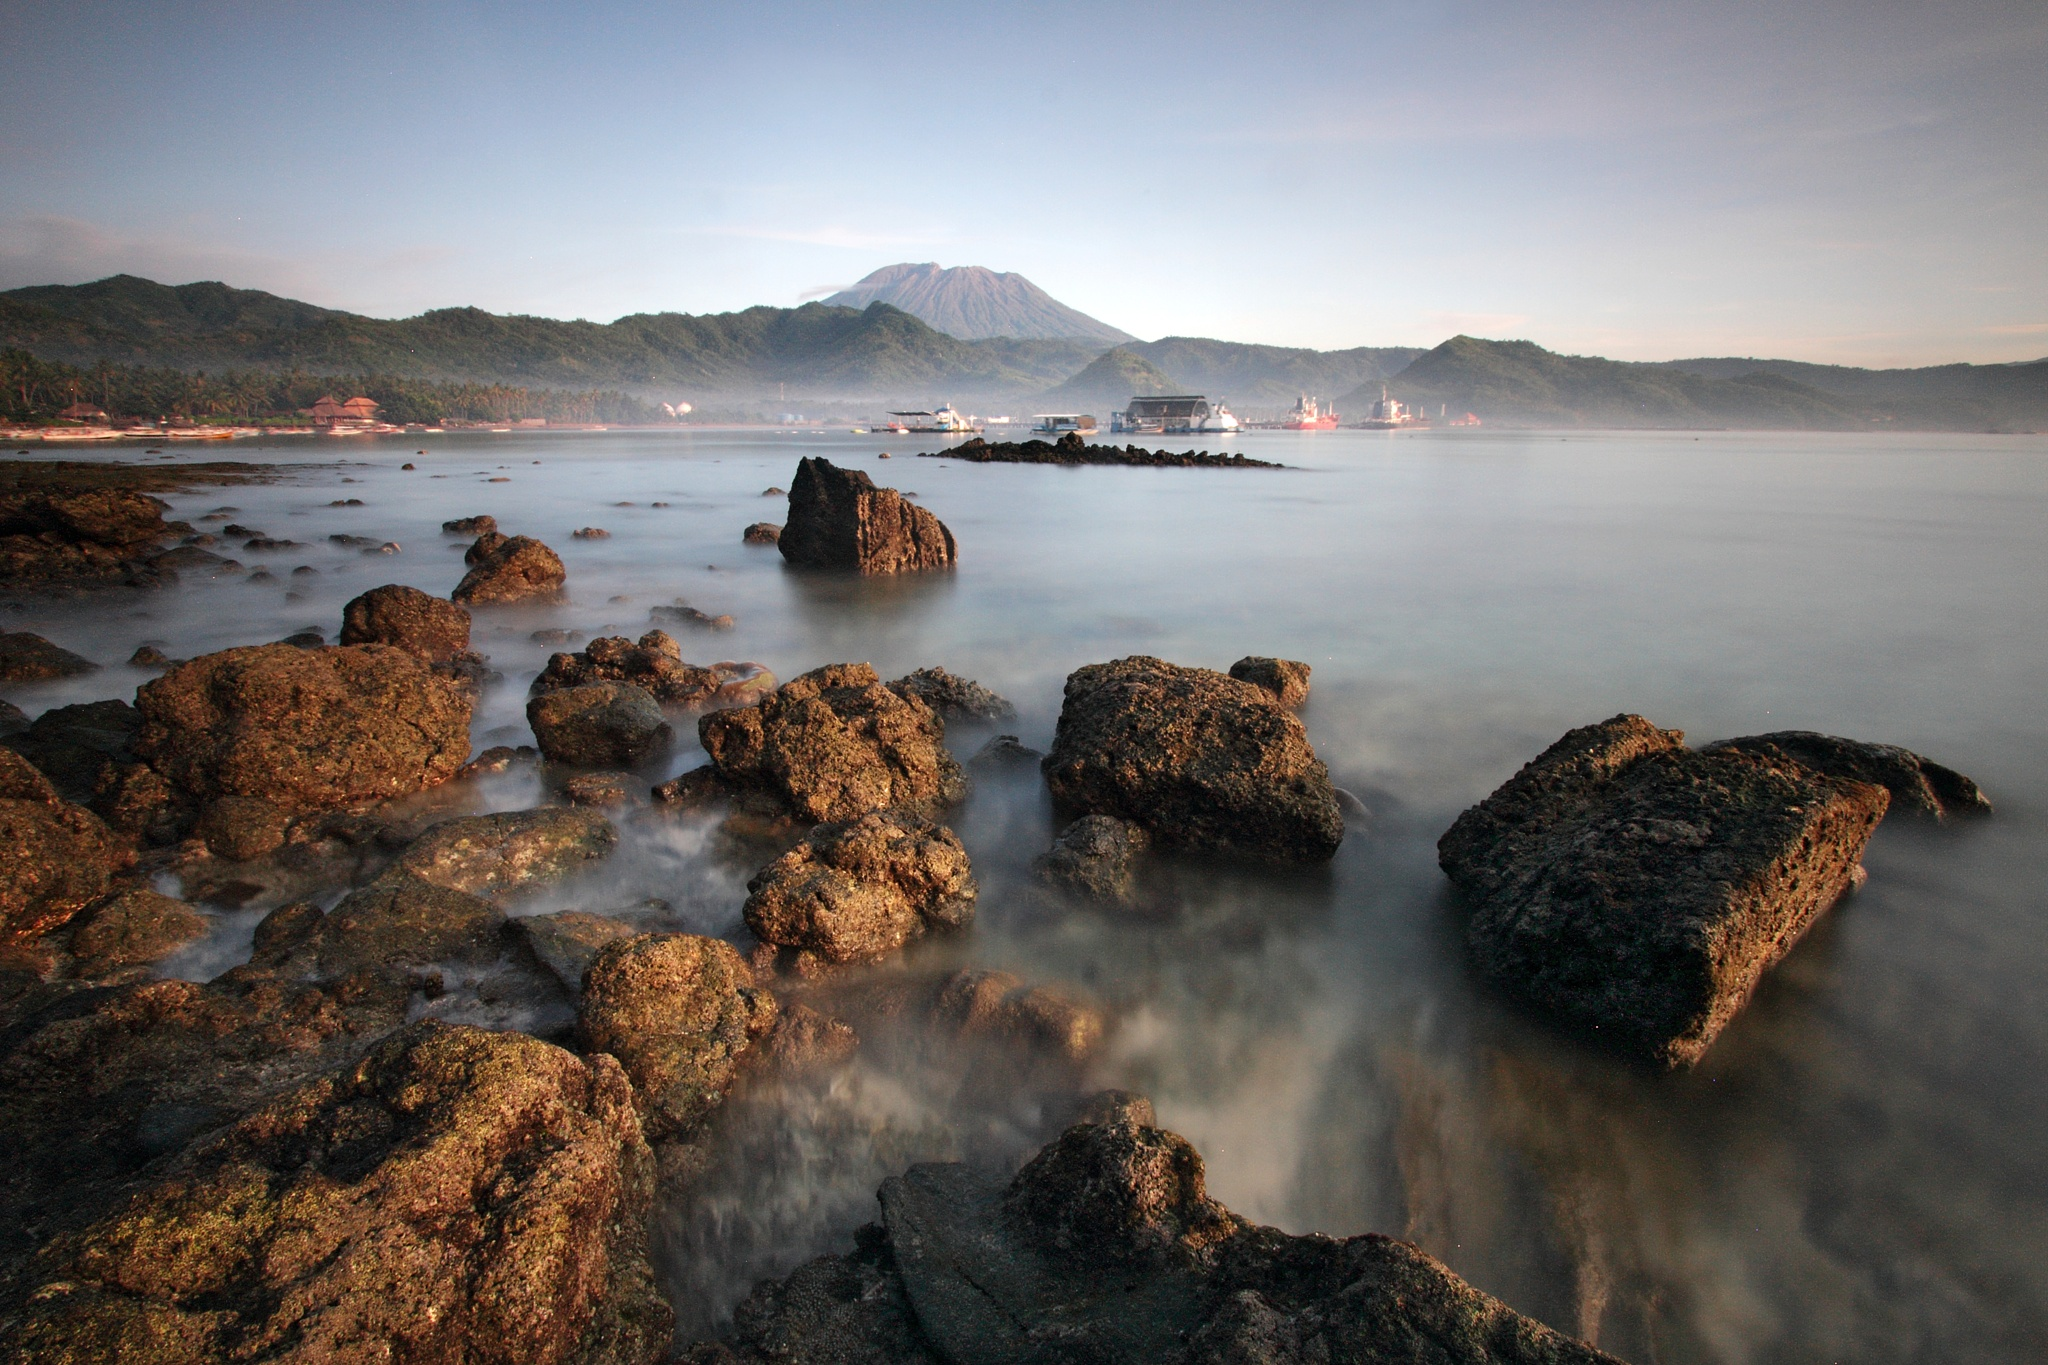 Amuk Bay by Gede Widiarsa